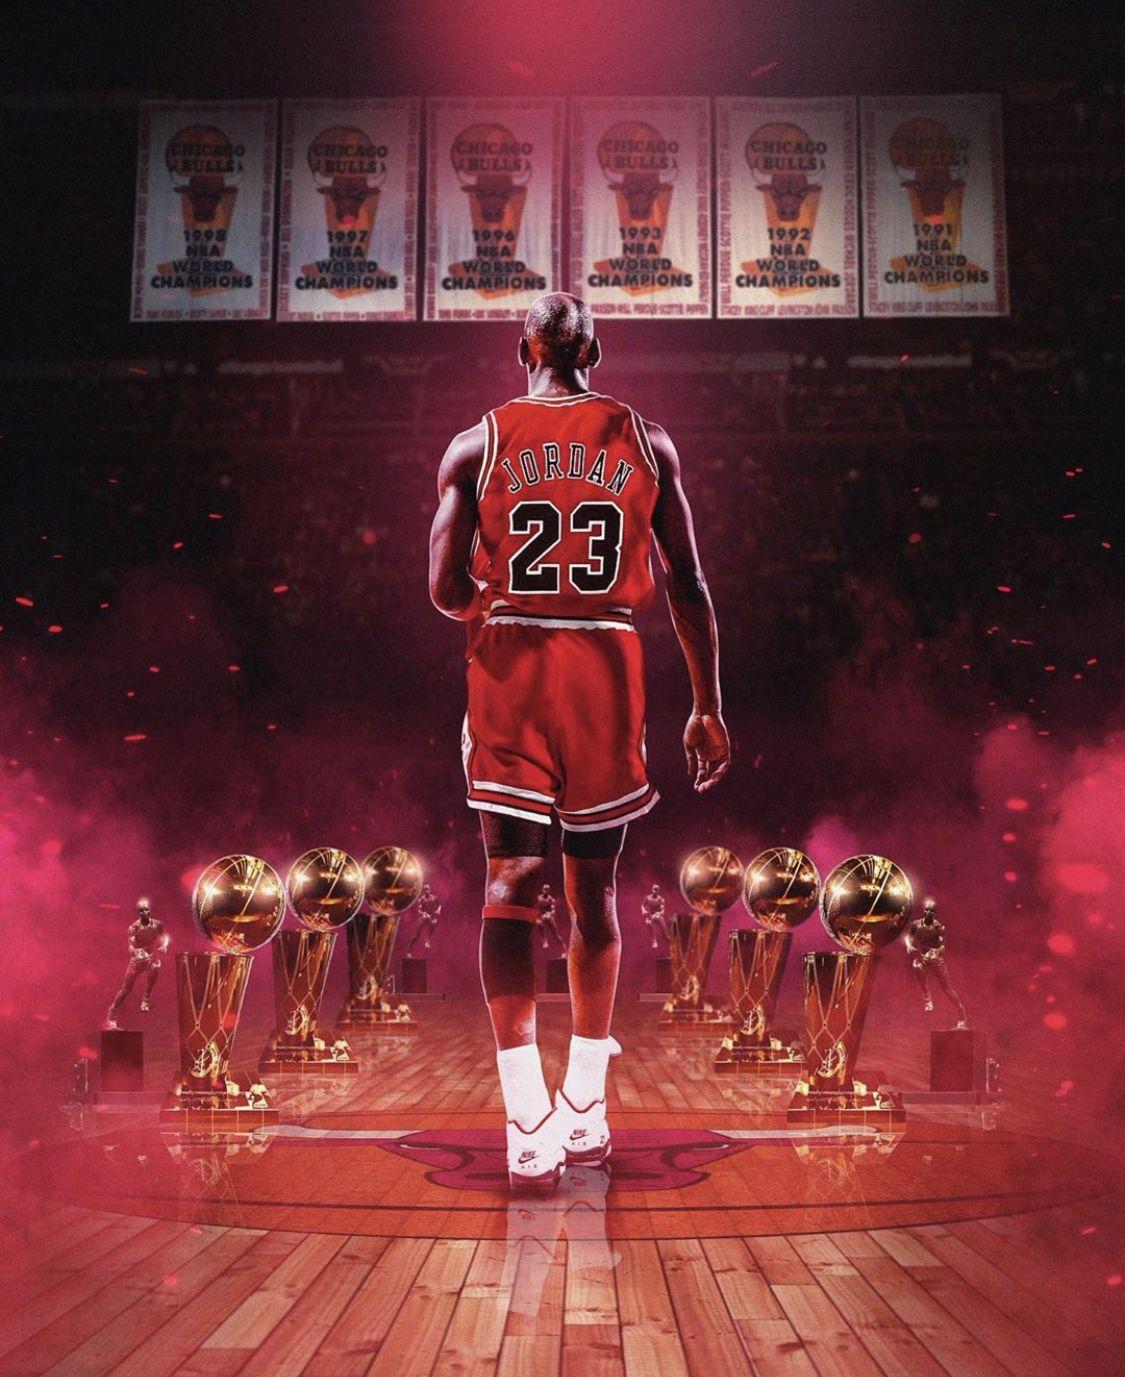 Jordan 23 Michael Jordan Basketball Michael Jordan Wallpaper Iphone Michael Jordan Art